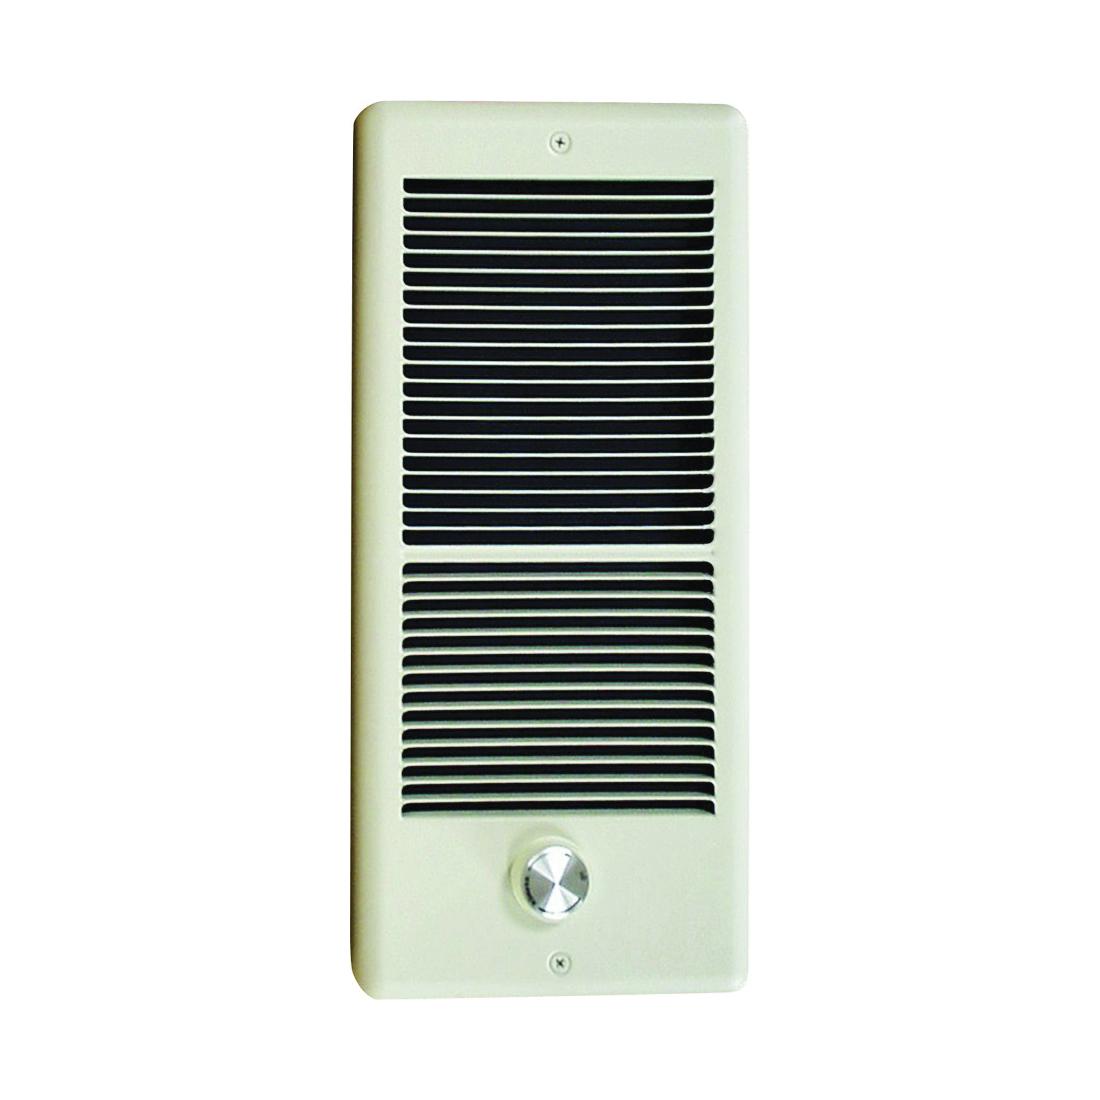 Picture of TPI E4315TRPW Electric Bath Heater with Wall Box, 12.5 A, 120 V, 5120 Btu, 70 cfm Air, White